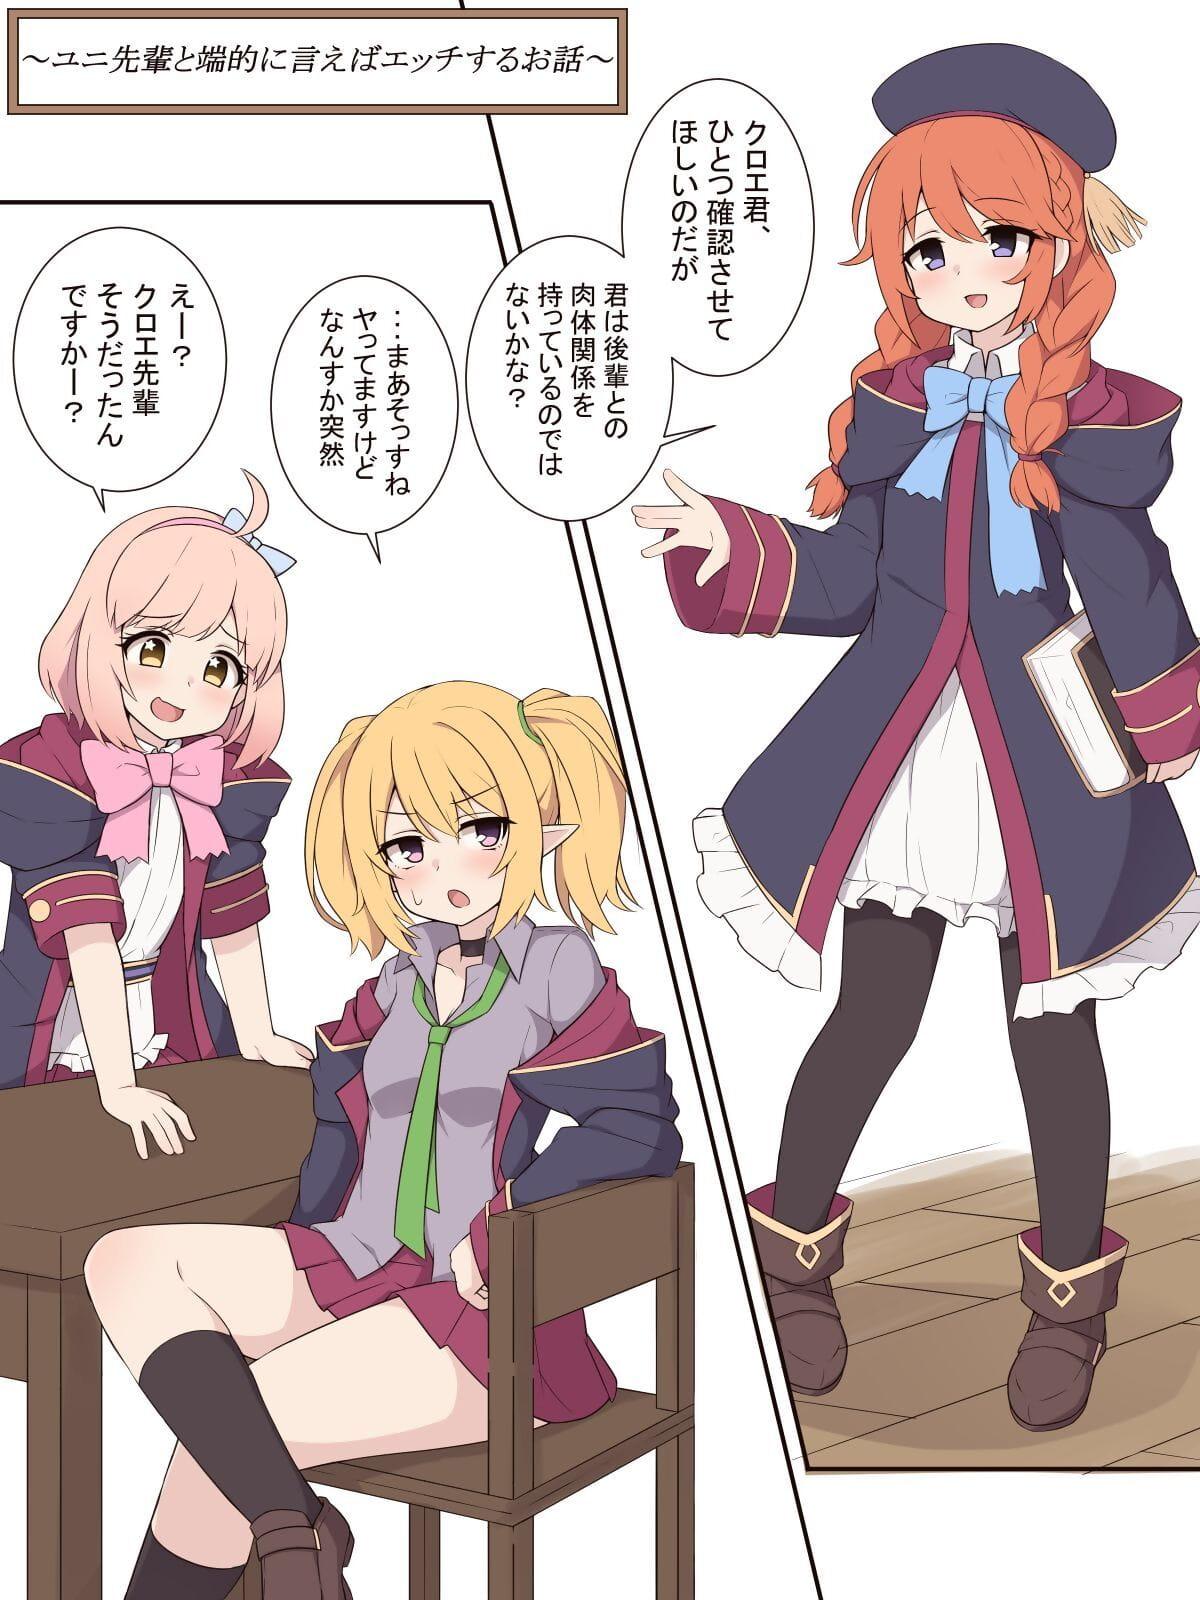 Blister Yuni Senpai to Tanteki ni Ieba Ecchi Suru Ohanashi Peer royalty Connect! Re:Dive